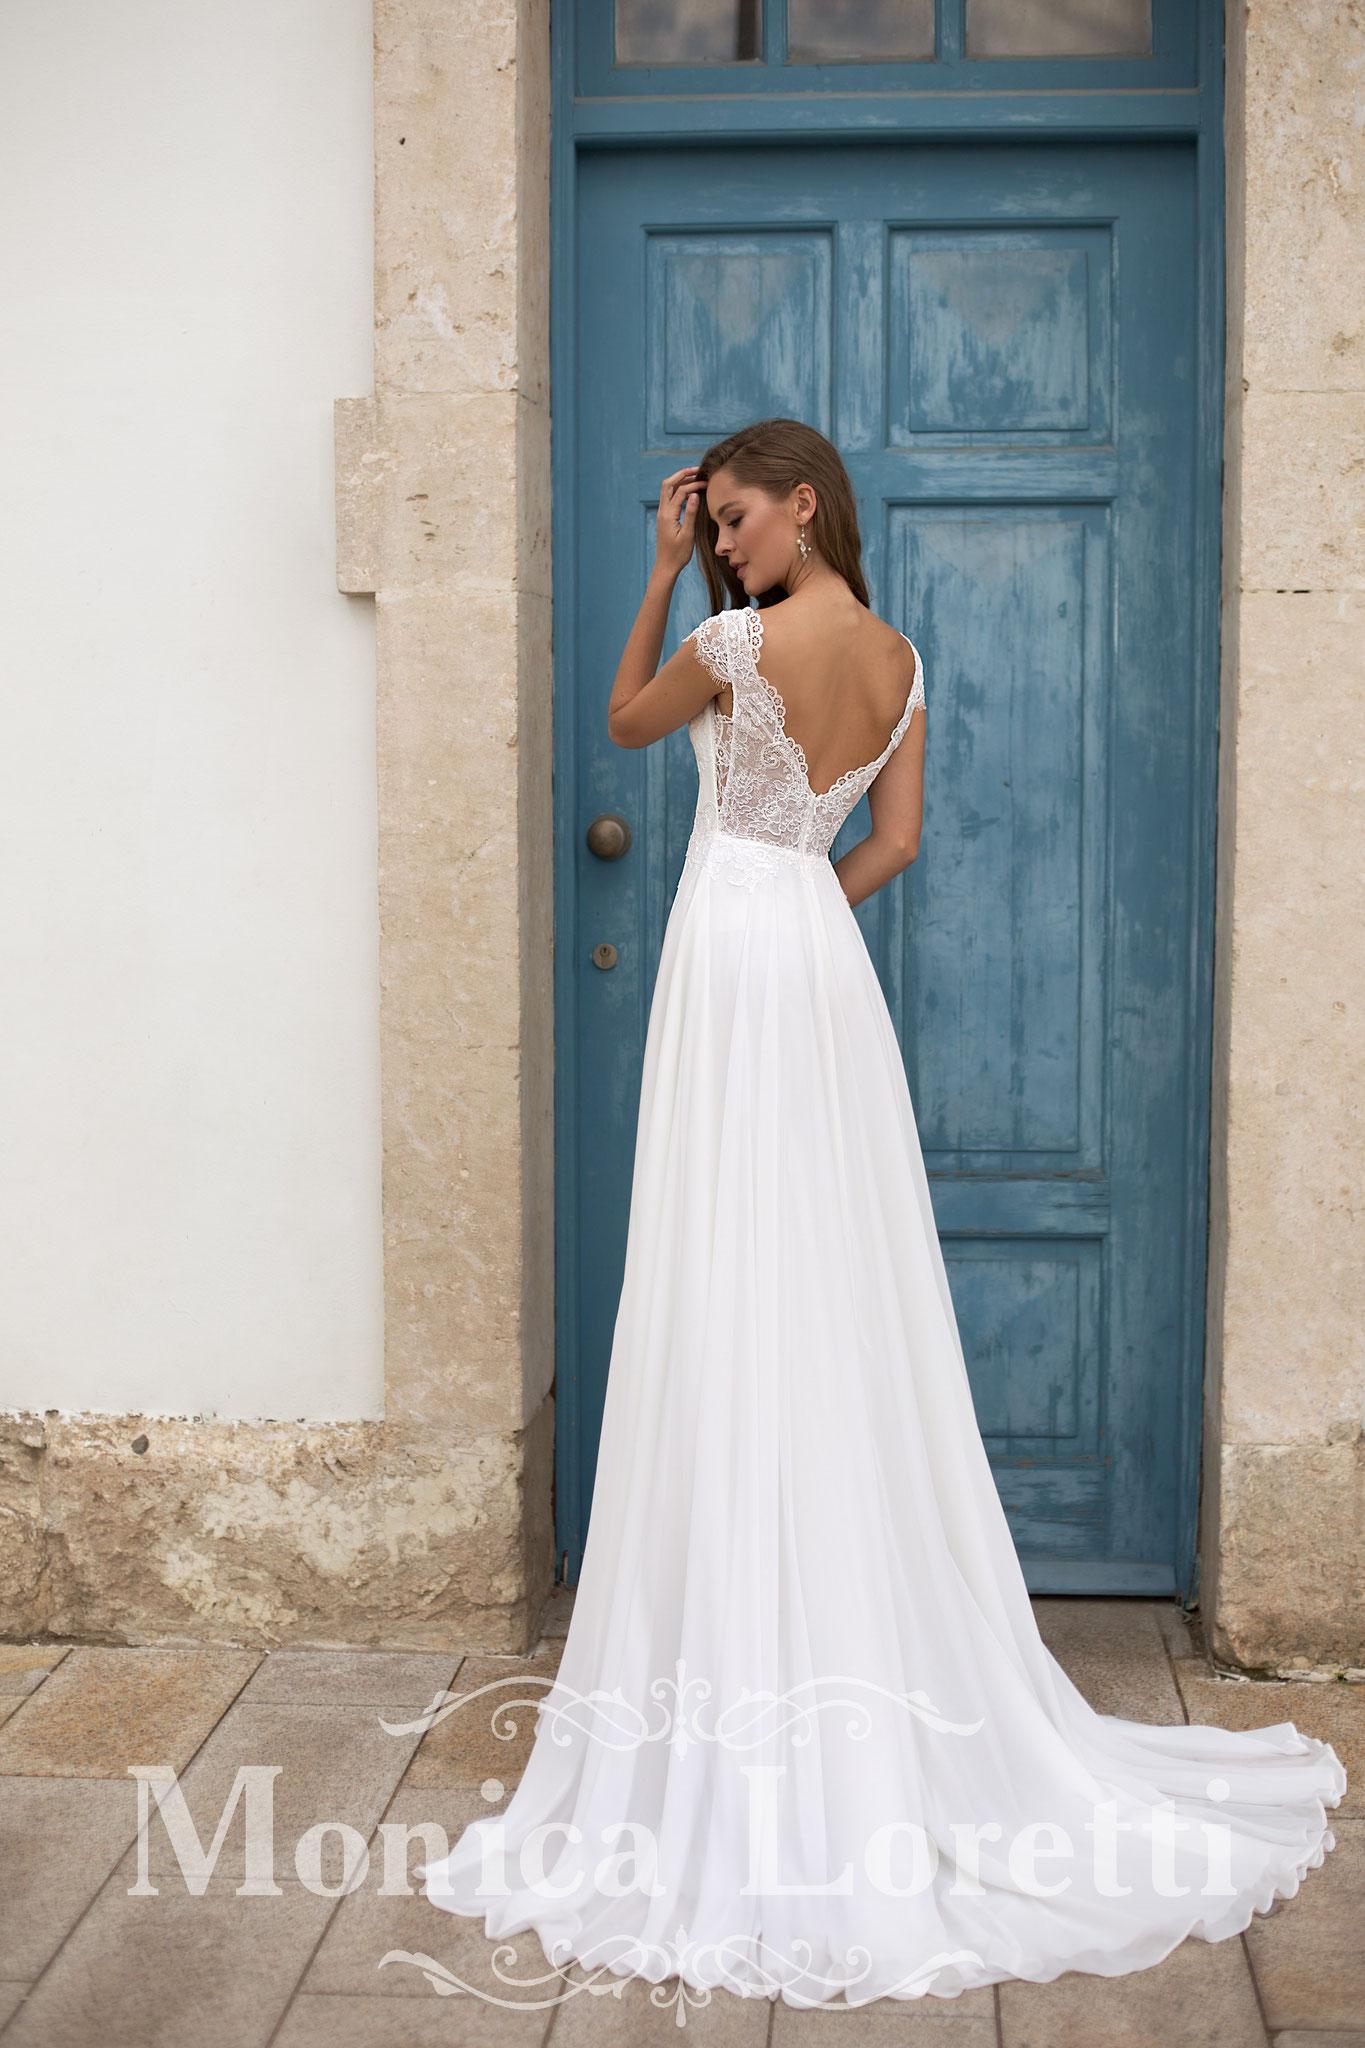 Brautmoden Monica Loretti myLovely